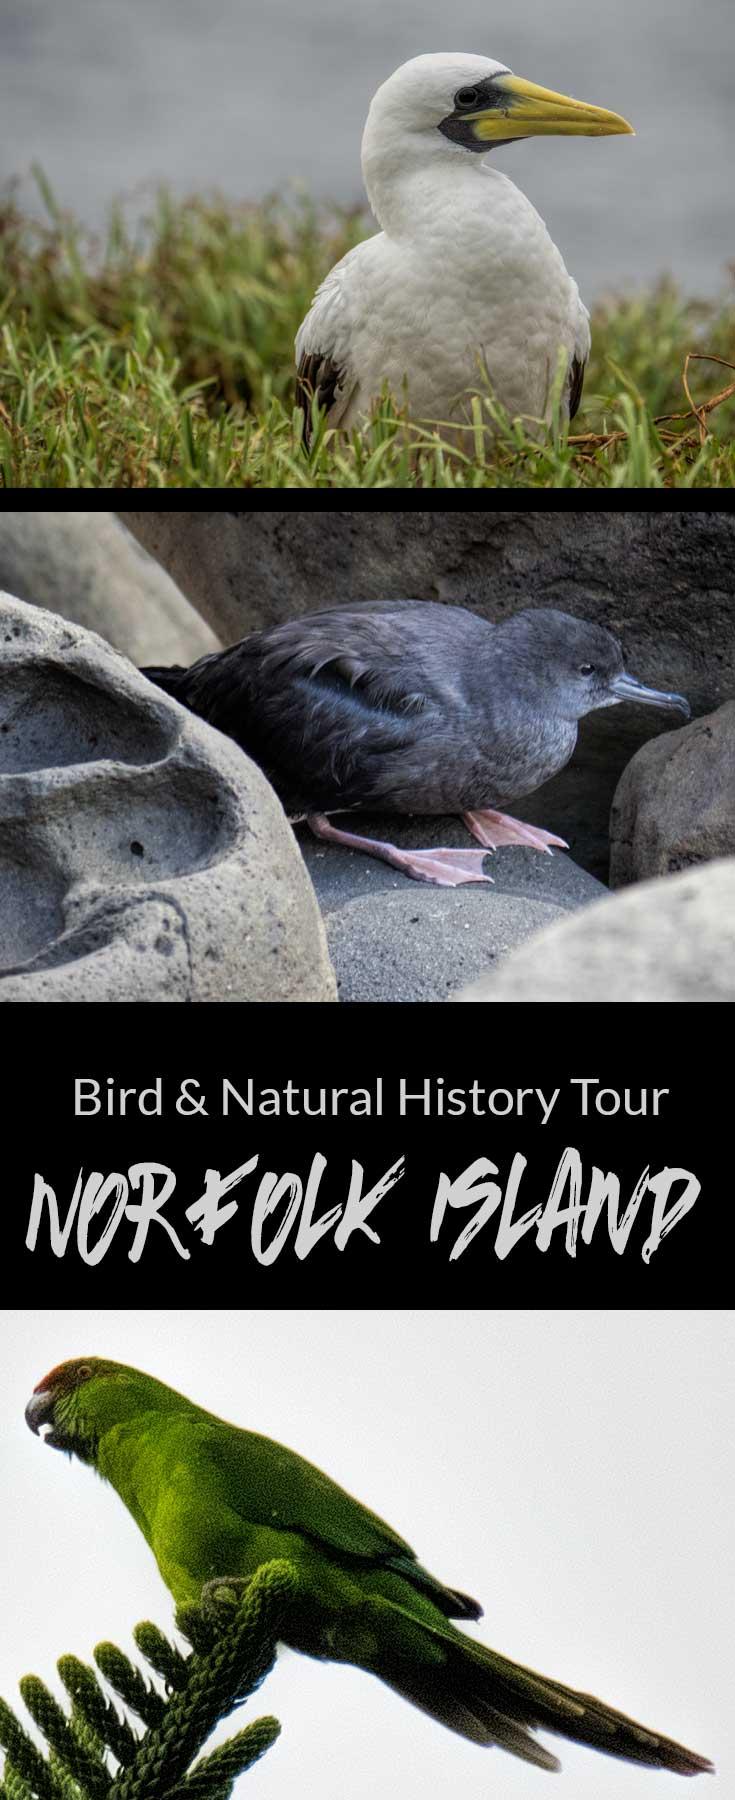 Birds and Natural History Tour, Norfolk Island, Australia